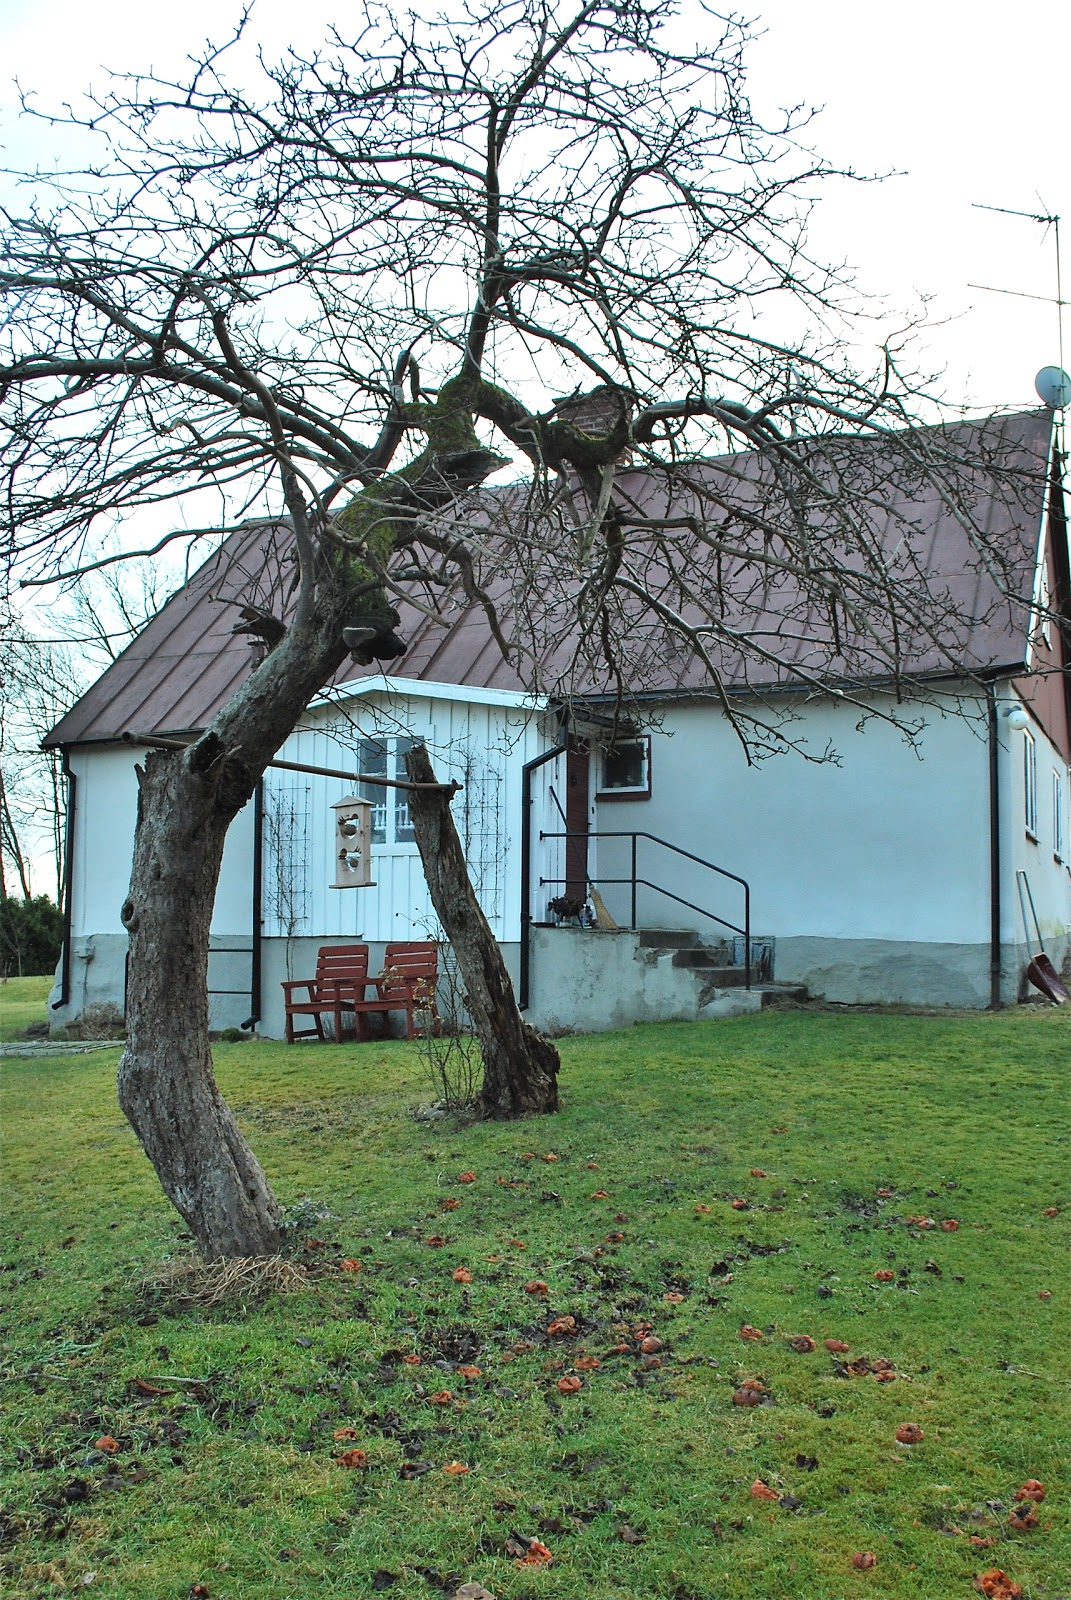 Fröken gröns blogg: mars 2012